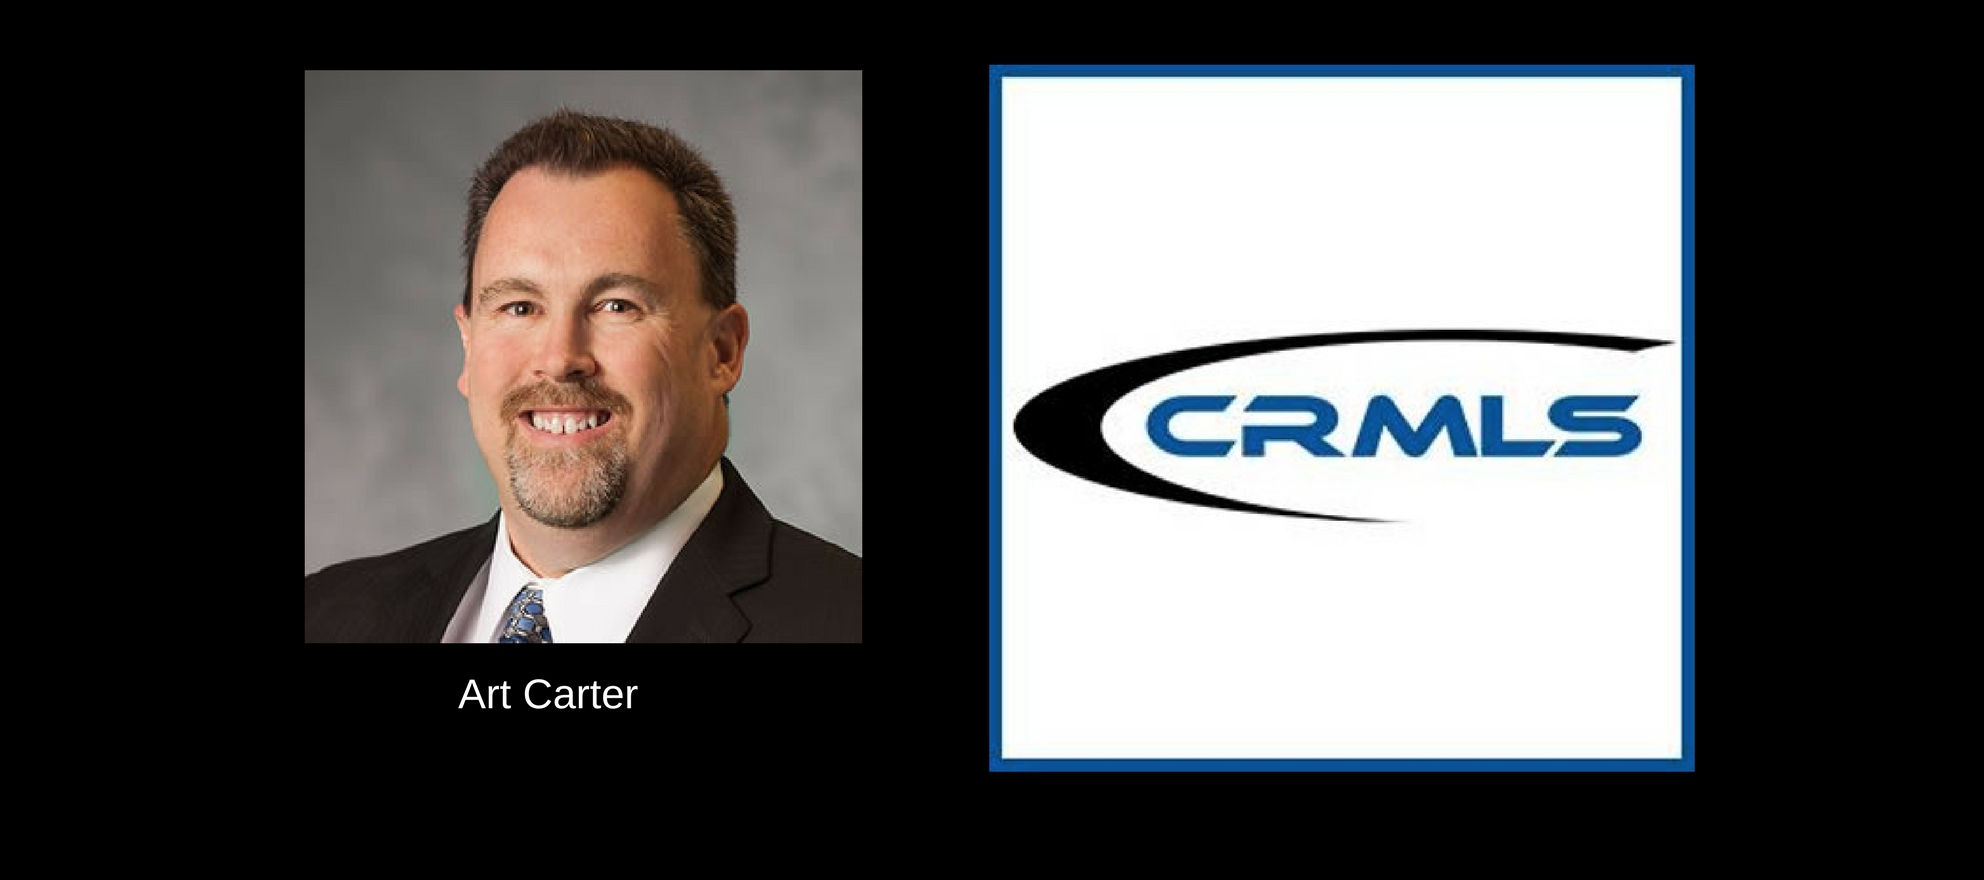 crmls brokerage syndication checks